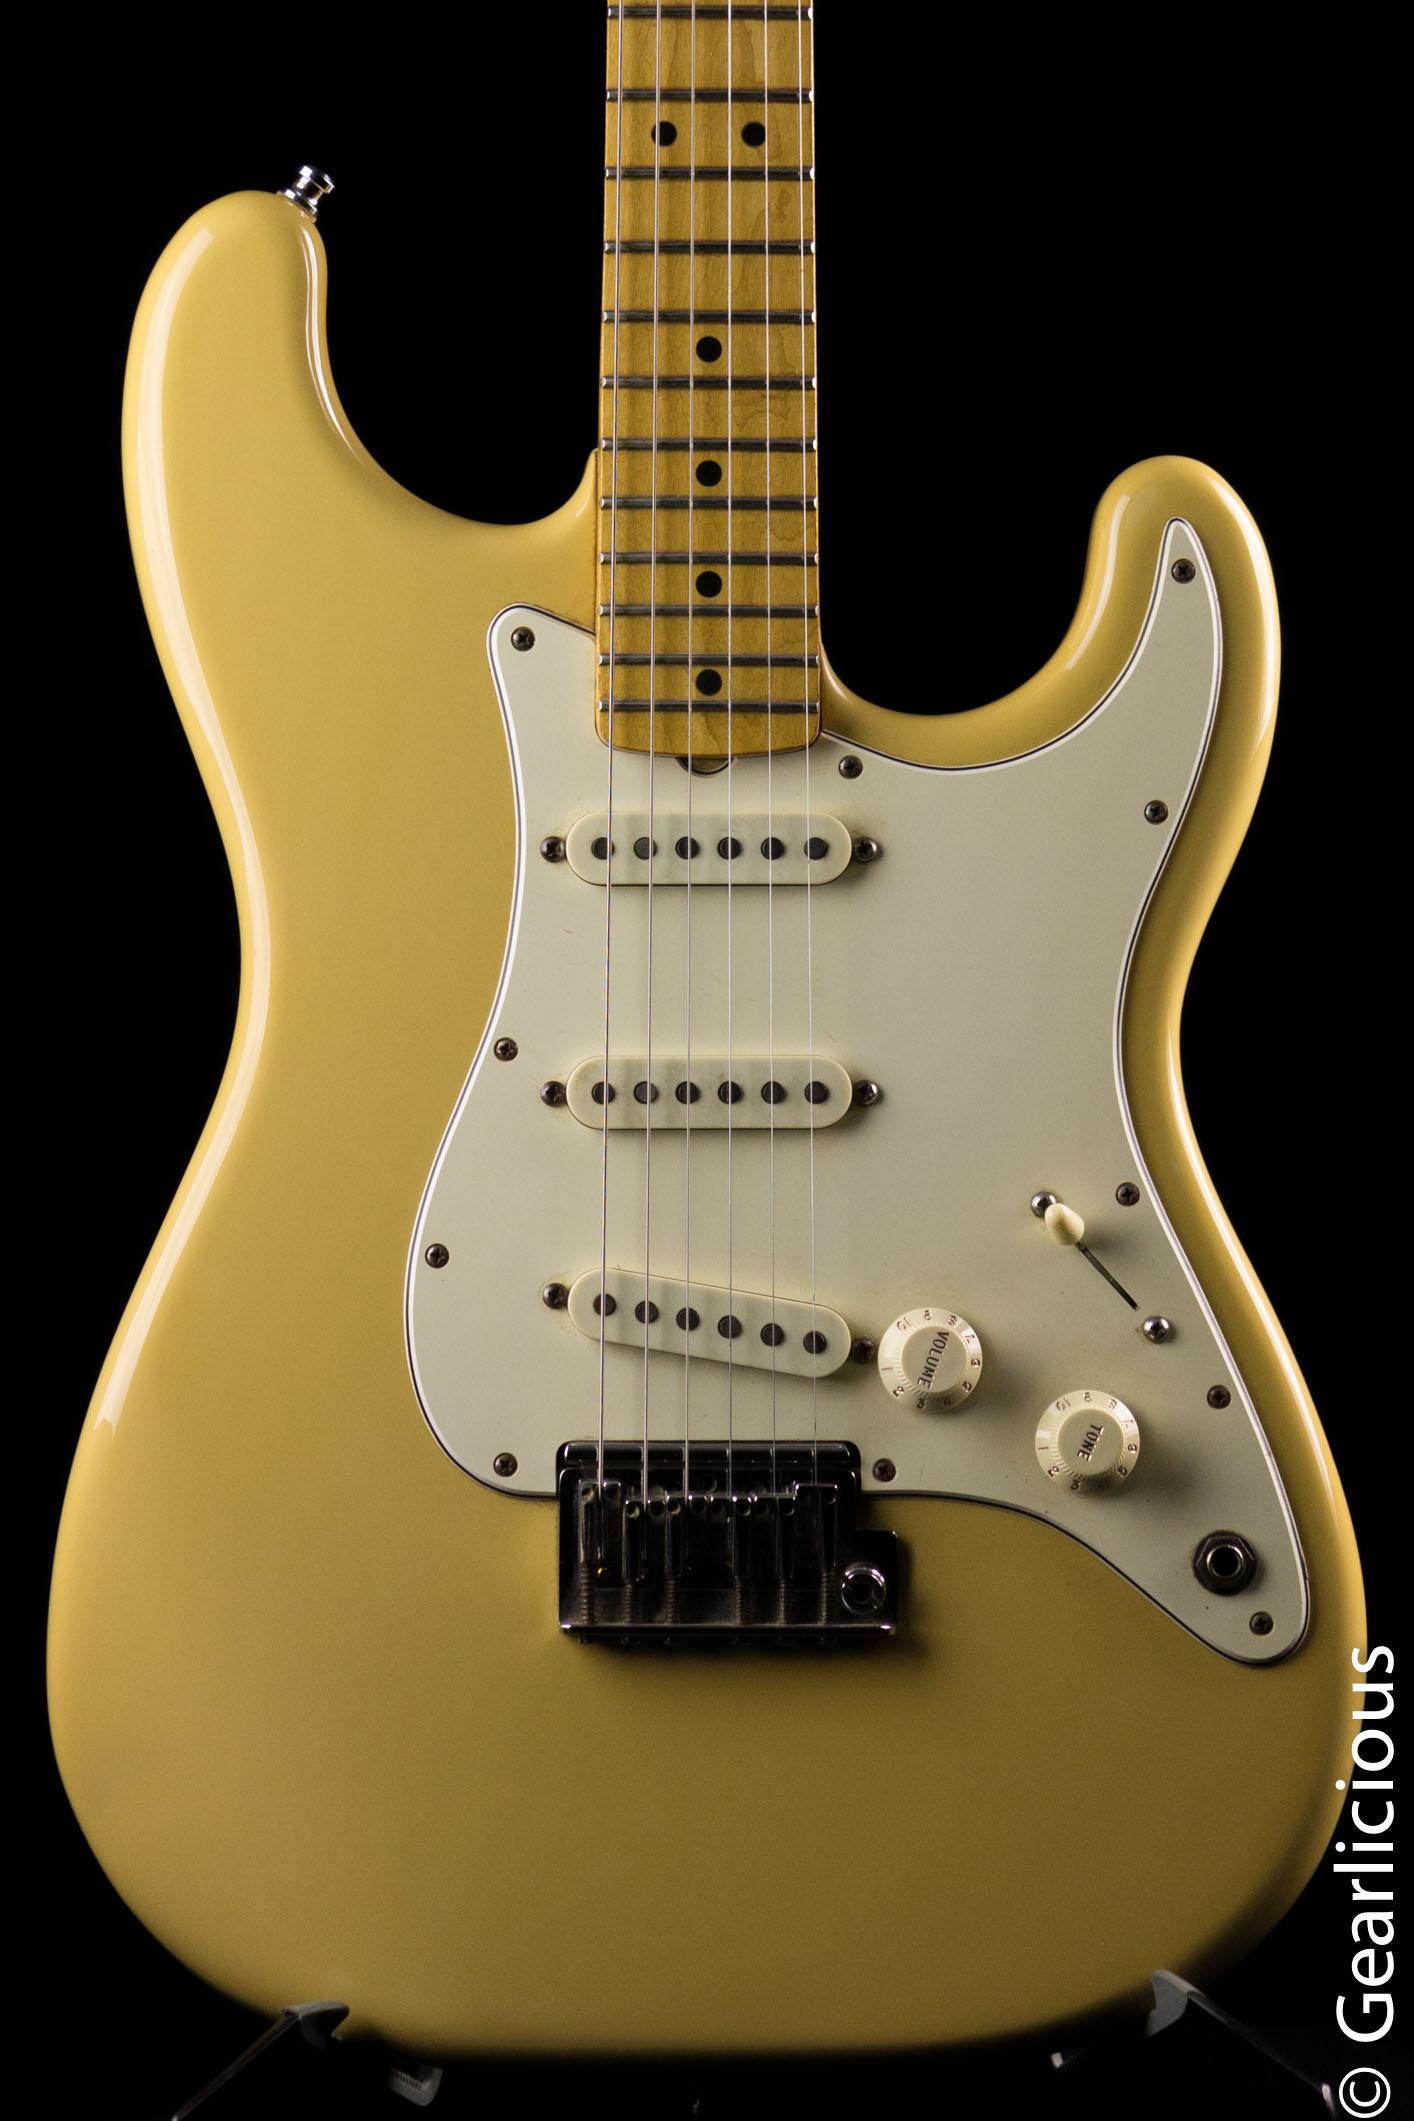 Fender strat vintage blanc